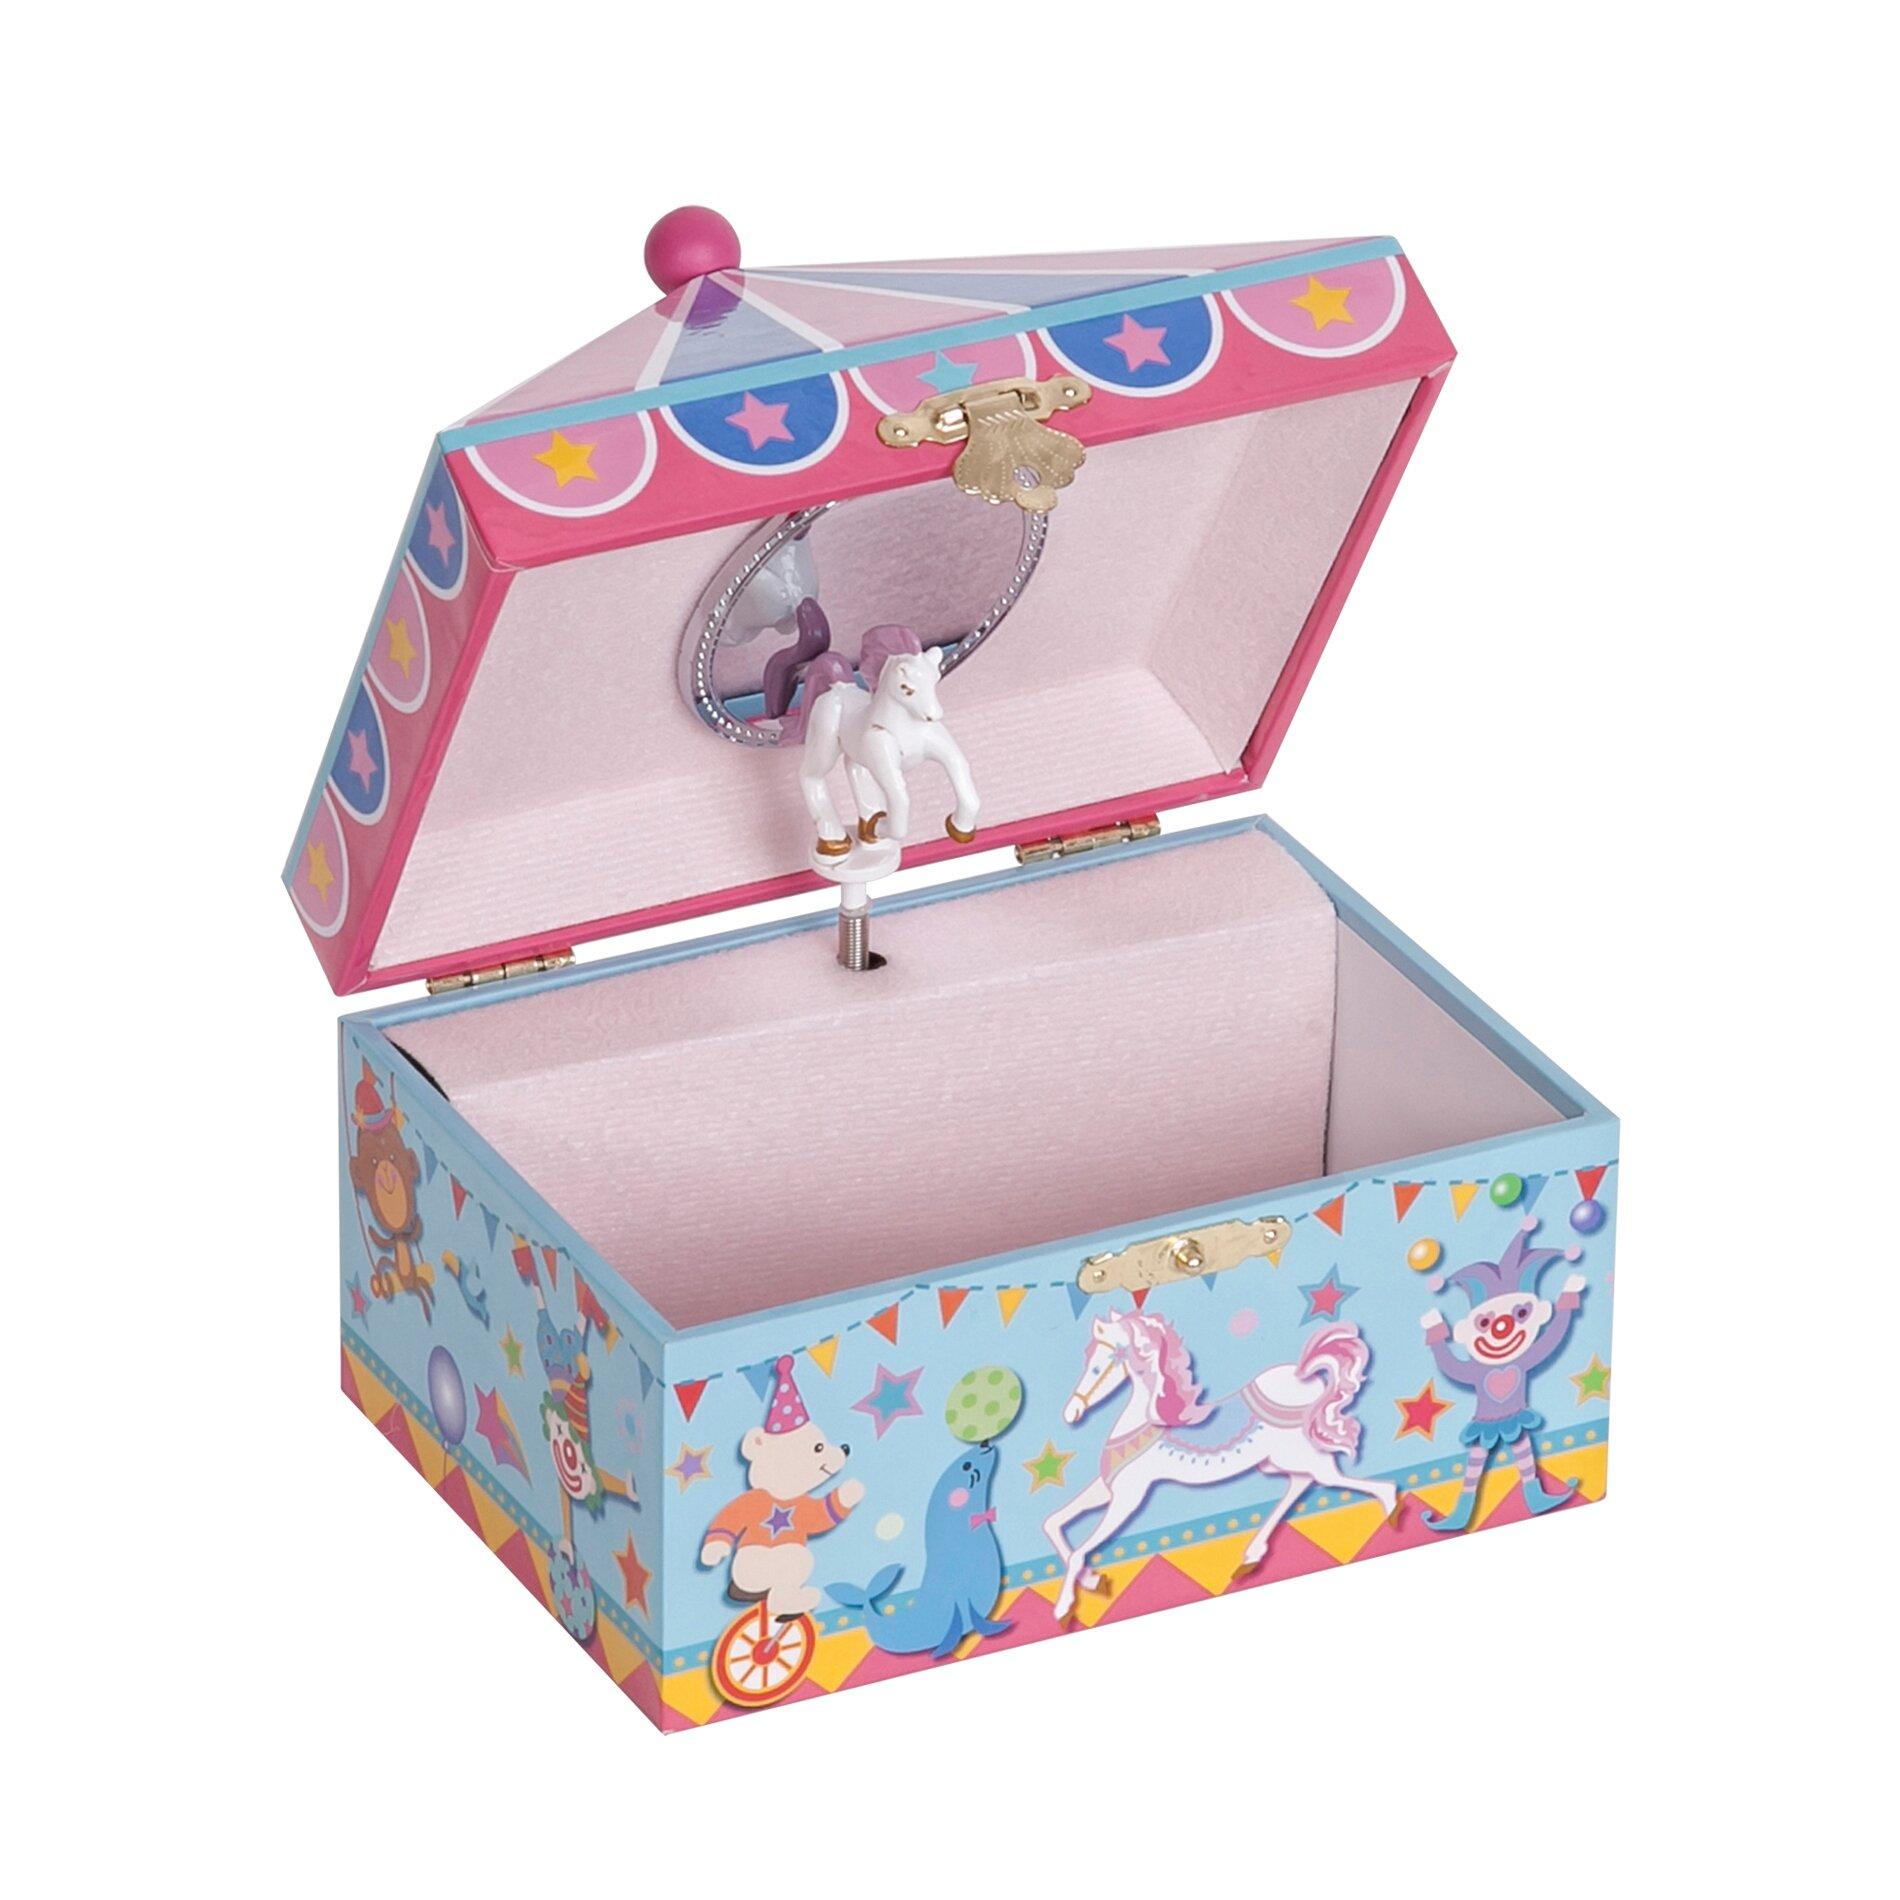 Mele amp Co Ellie Musical Jewelry Box amp Reviews Wayfair : Ellie Musical Jewelry Box 00700S15M from www.wayfair.com size 1900 x 1900 jpeg 382kB